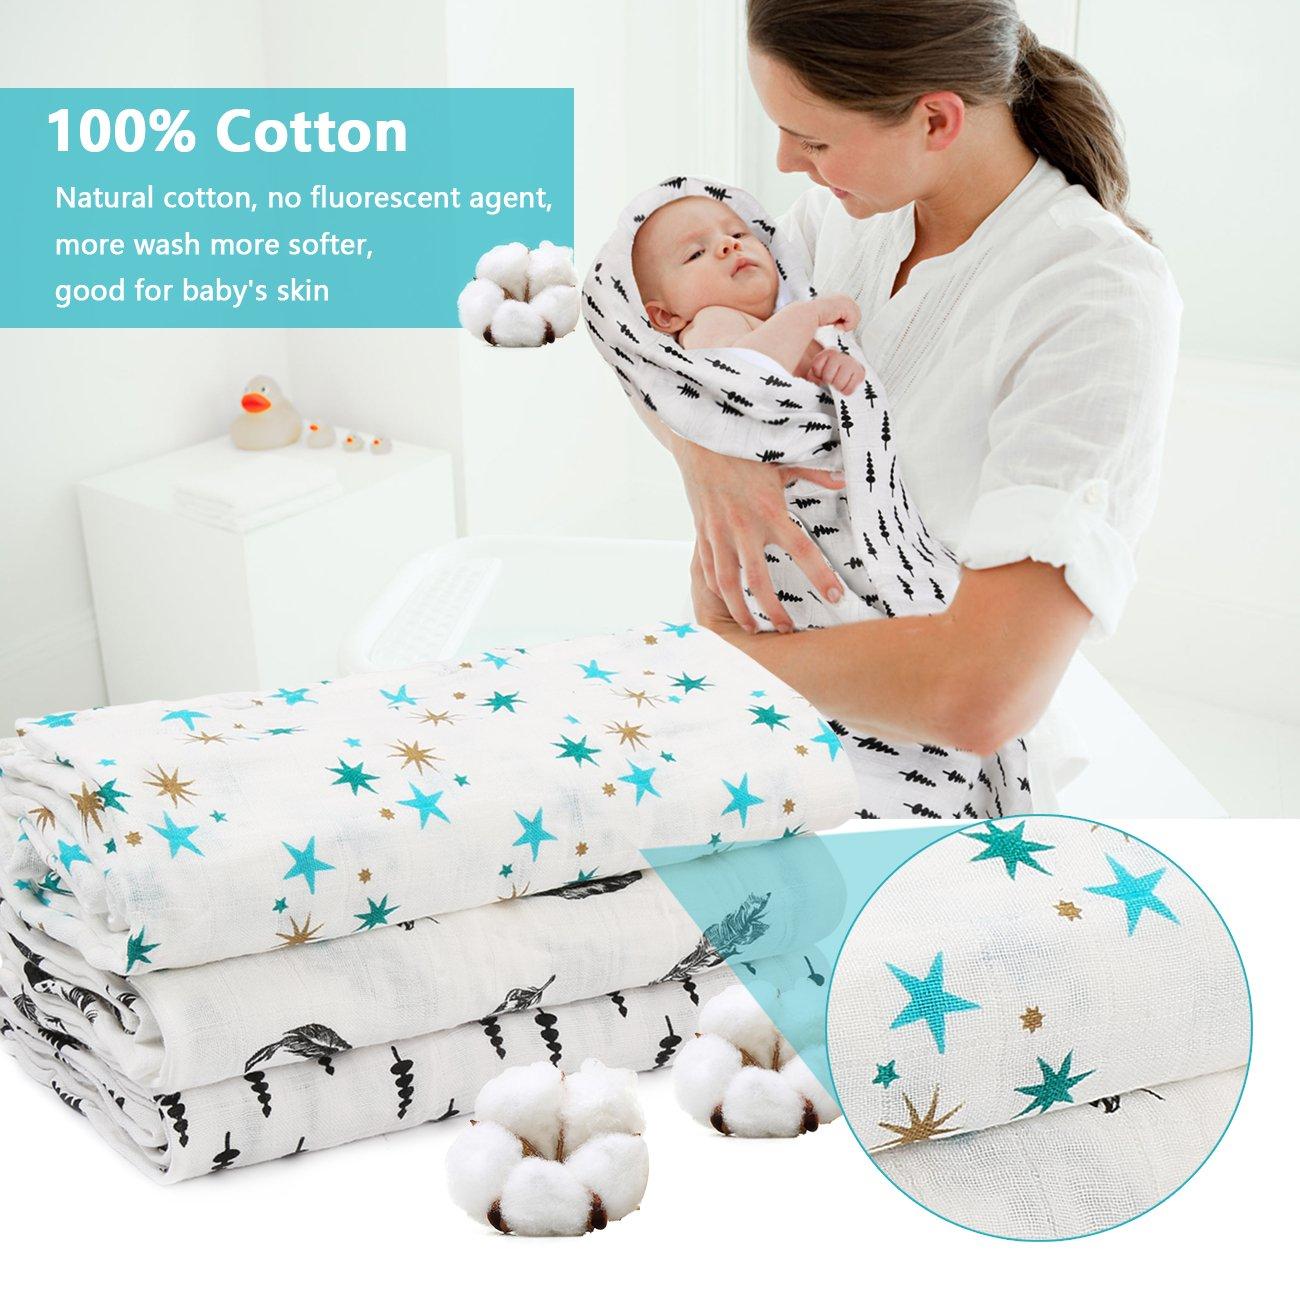 Amazon.com: Bebé muselina swaddle transpirable Multi-Use ...